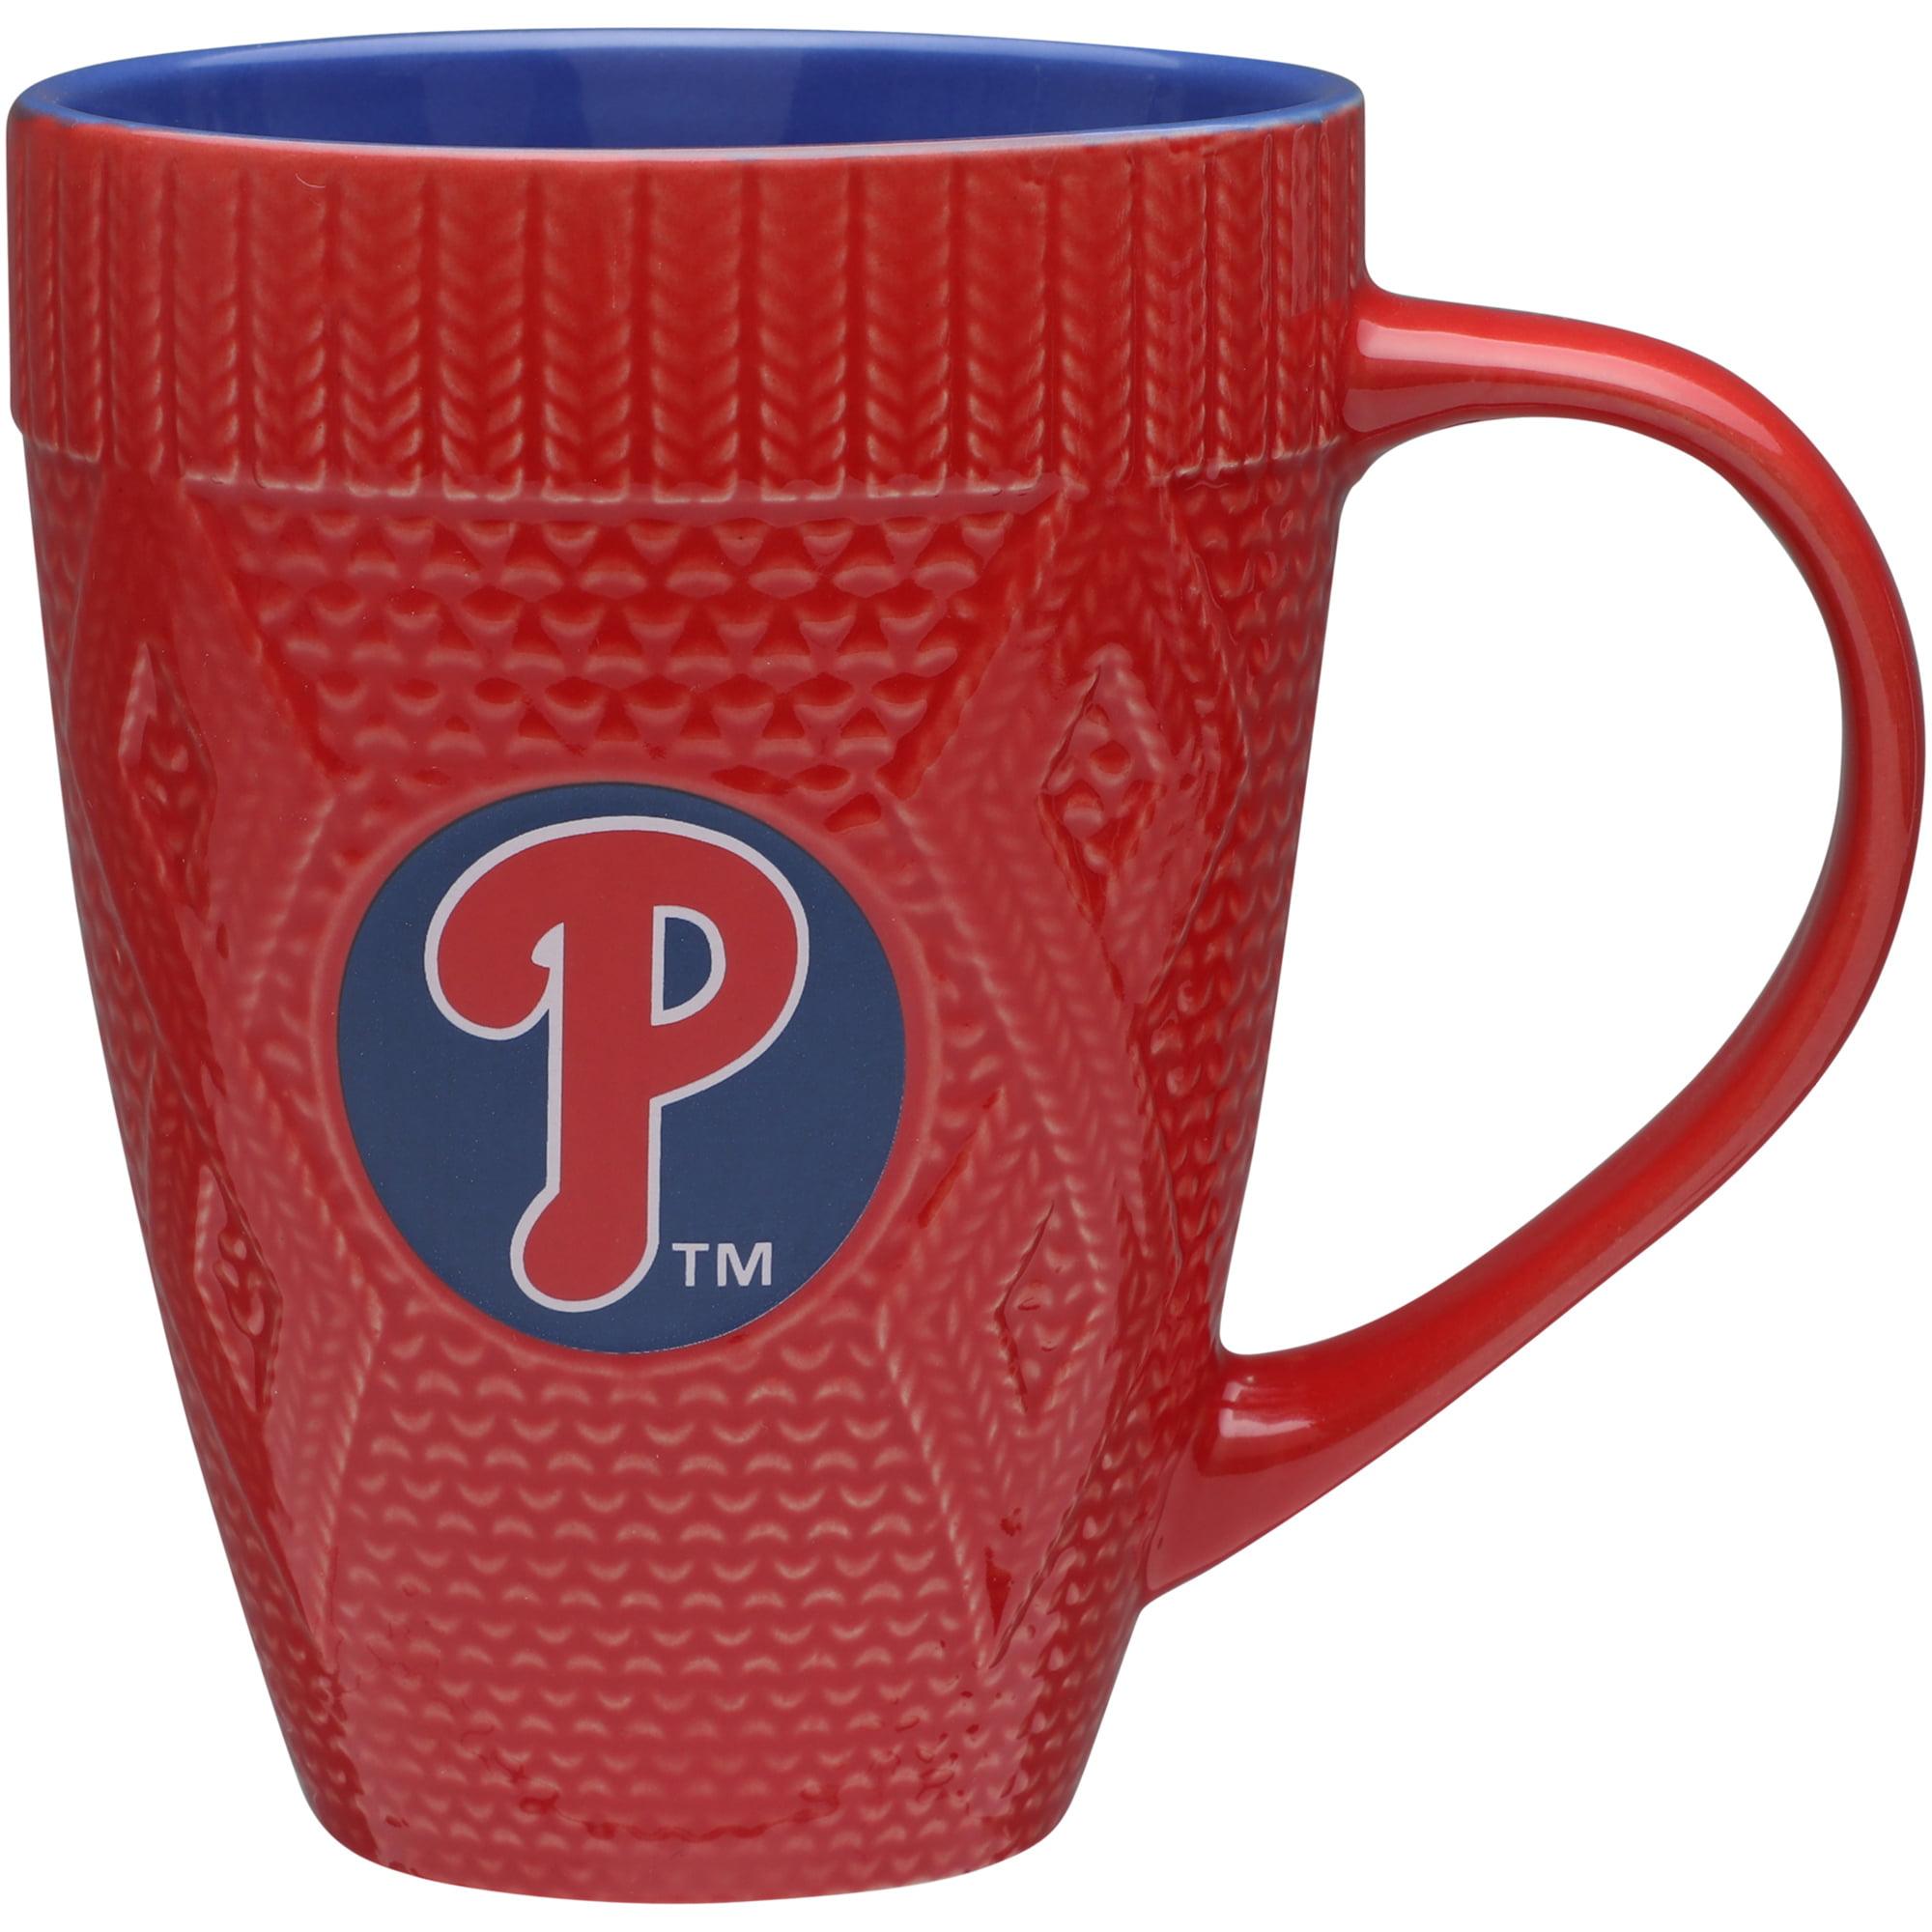 Philadelphia Phillies 16oz. Sweater Mug - No Size